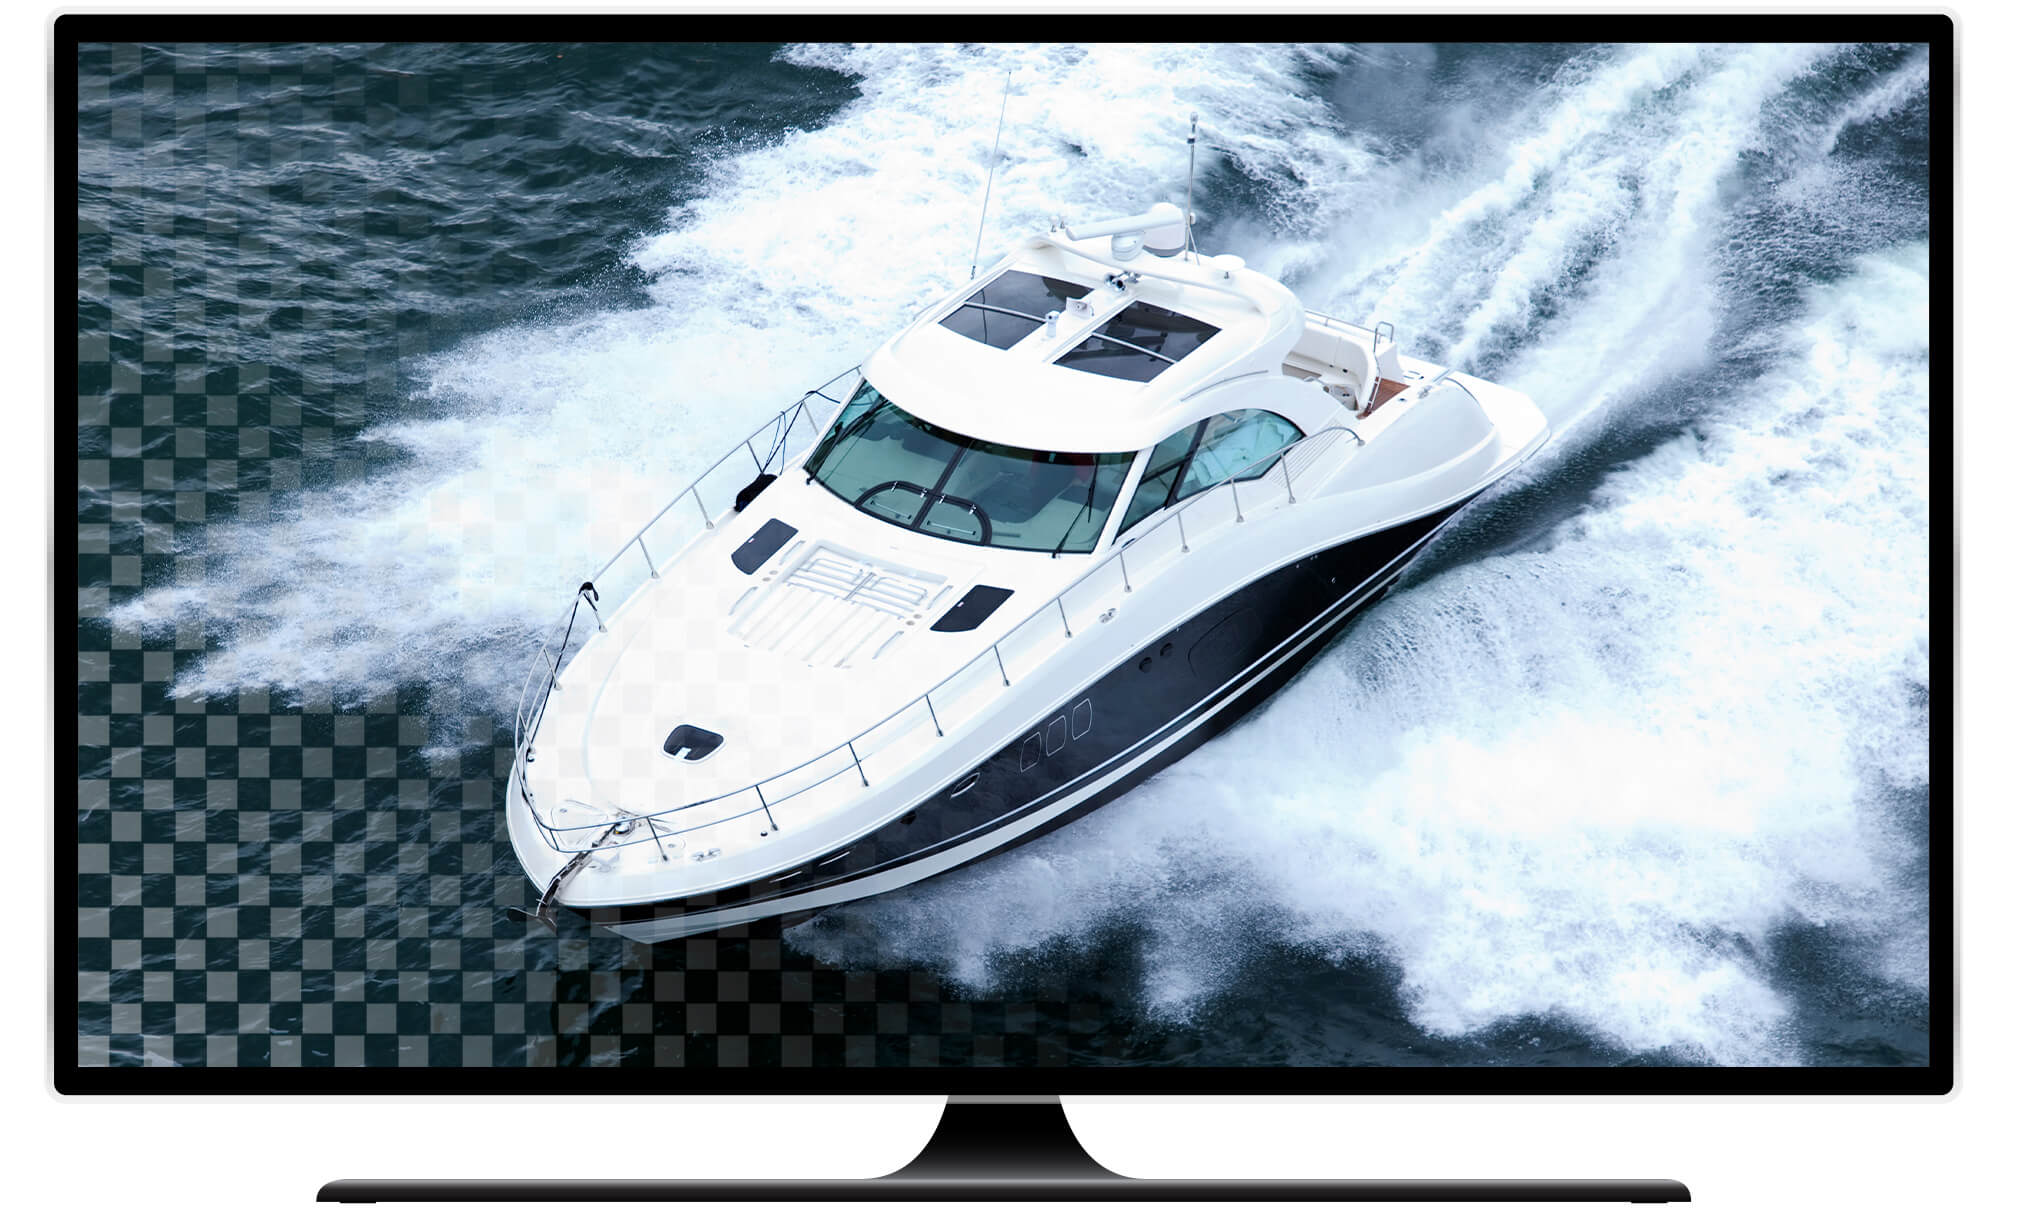 speed-boat-on-tv-encoding